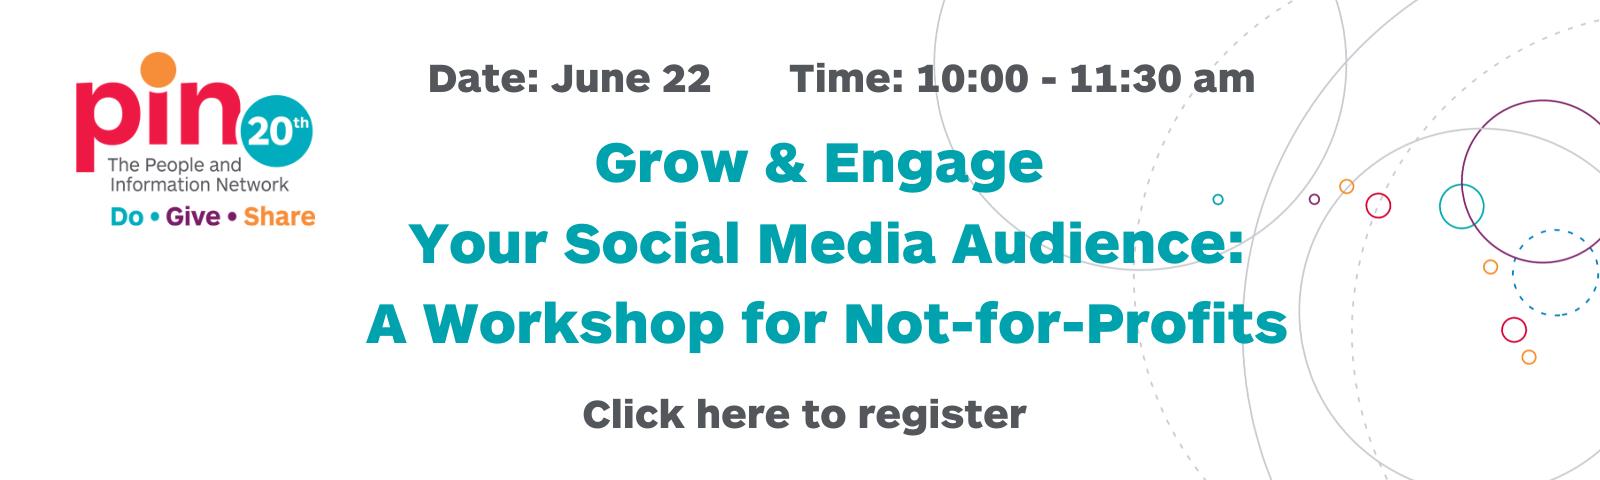 social media workshop for nonprofits